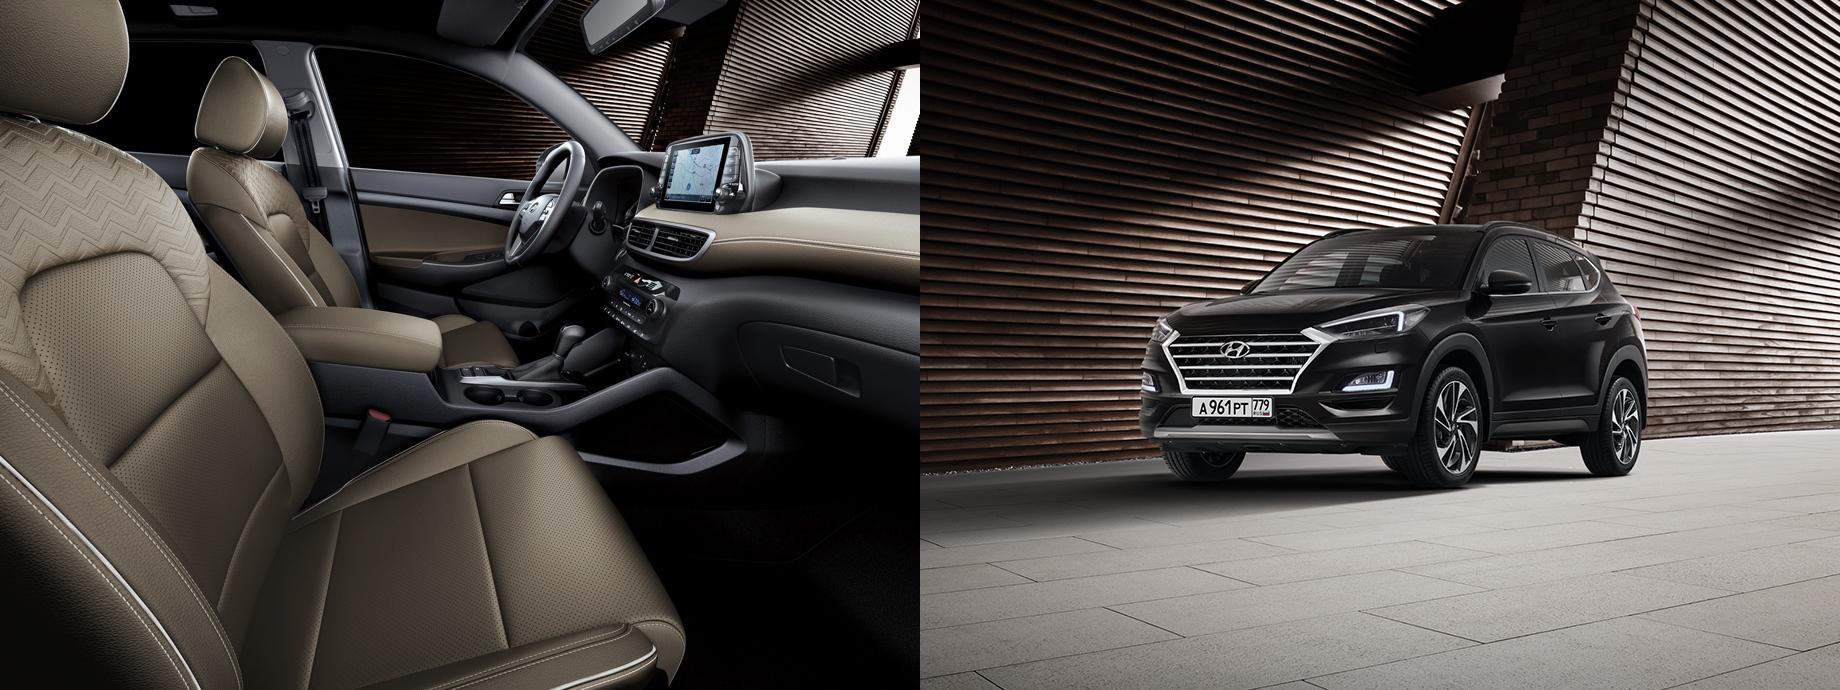 Hyundai Creta иTucson Black&Brown пополнили ассортимент спецсерий